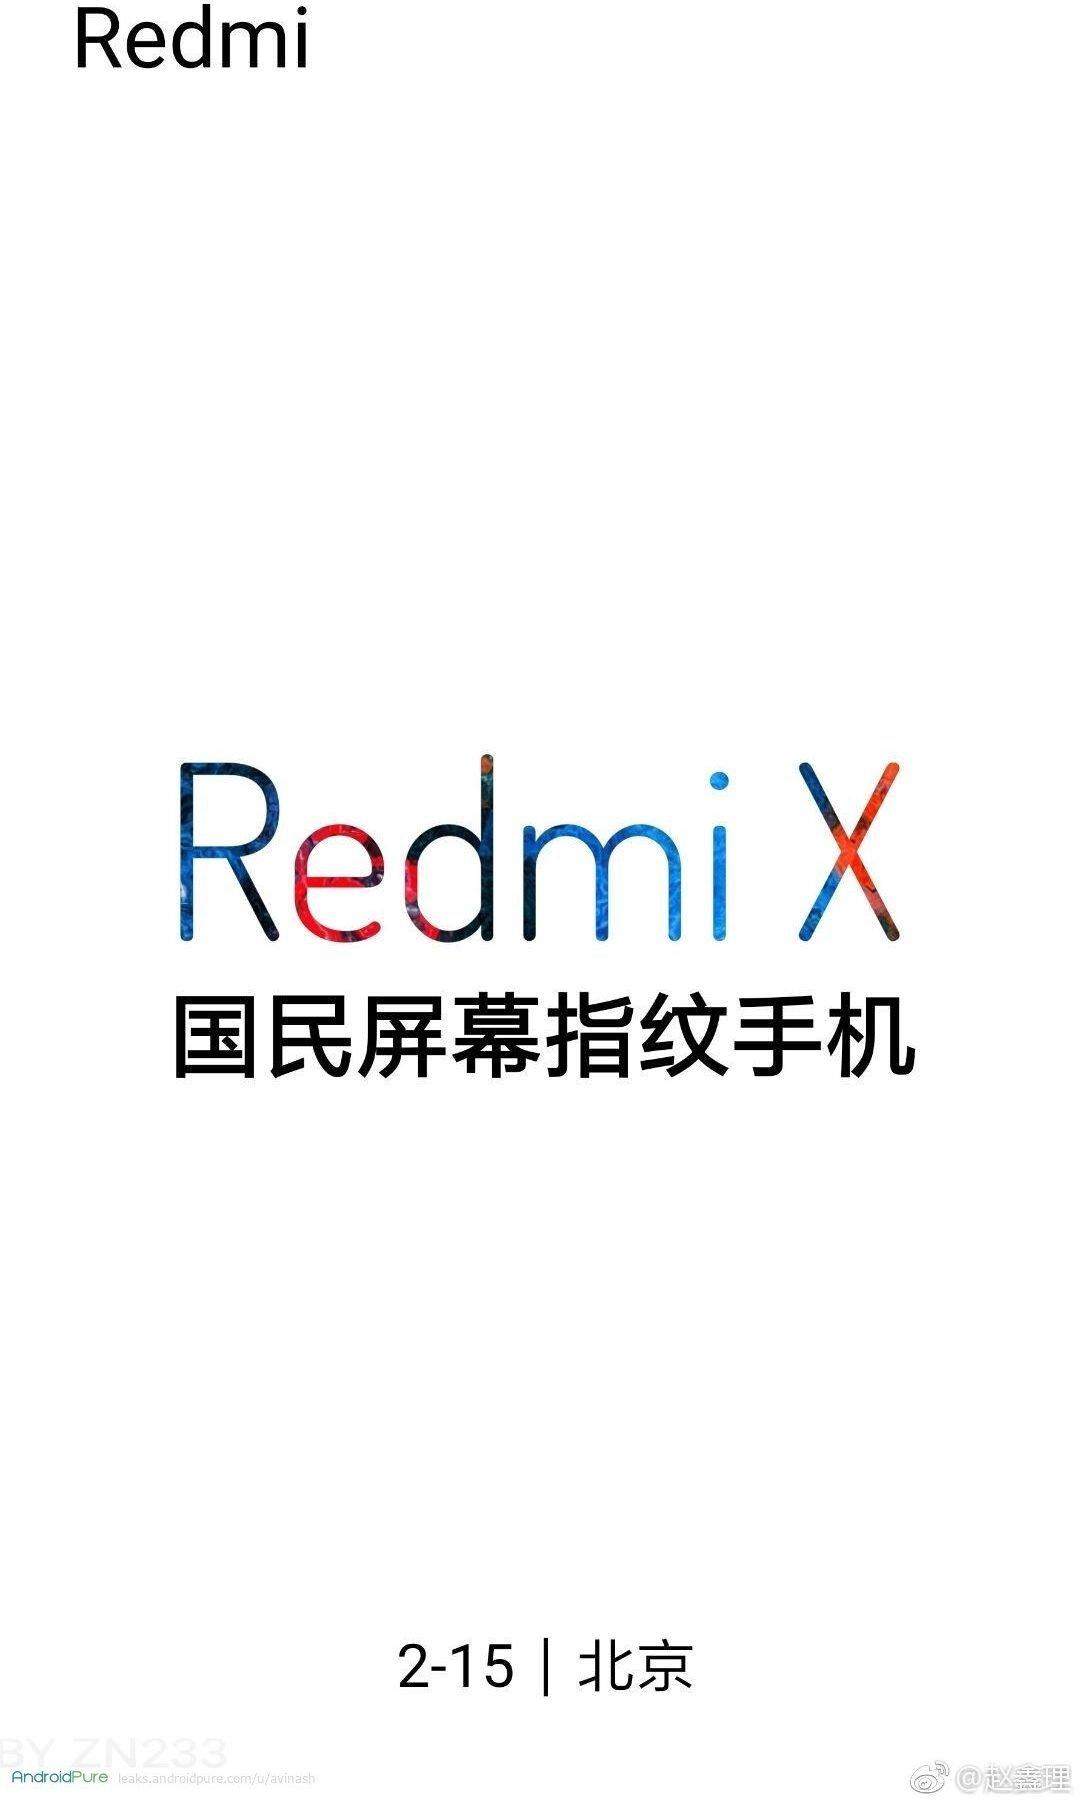 Redmi X launch